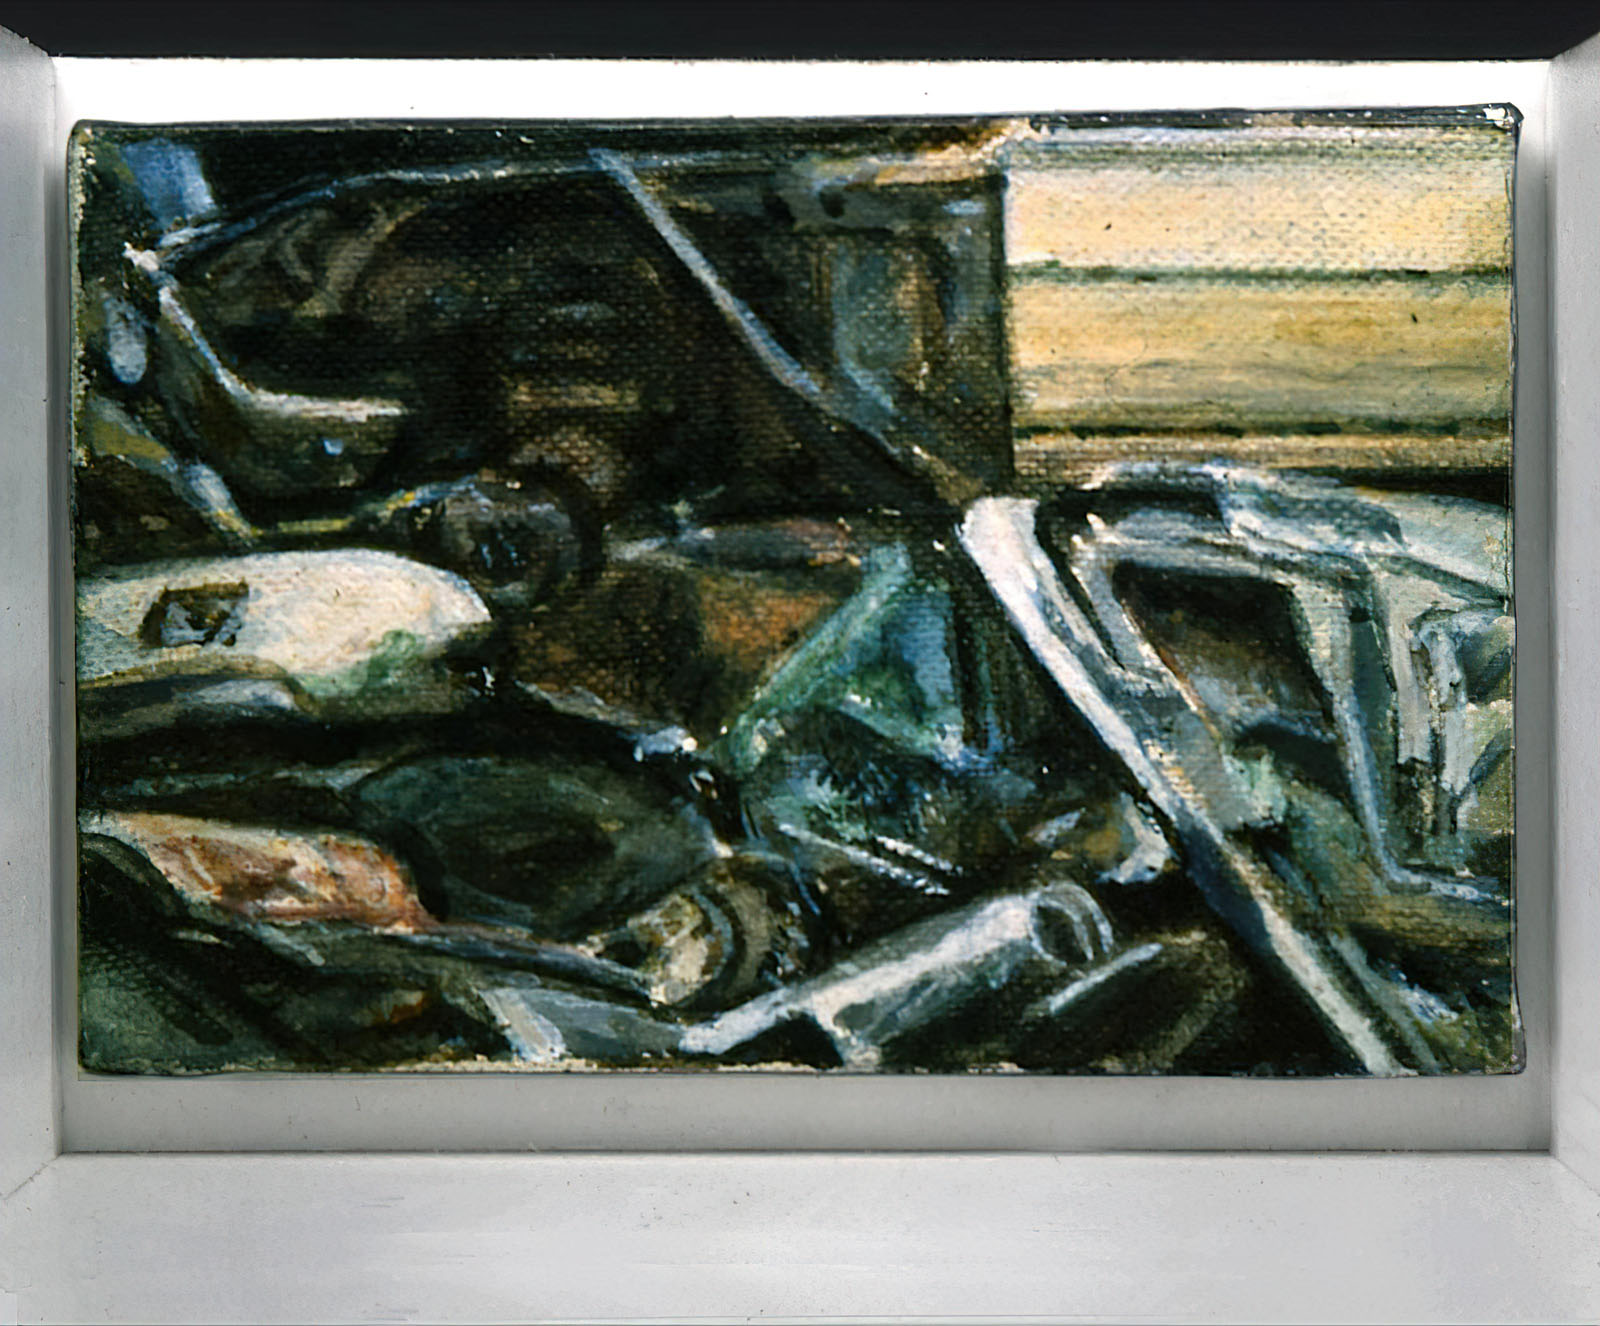 John Salt - Wreck Pile